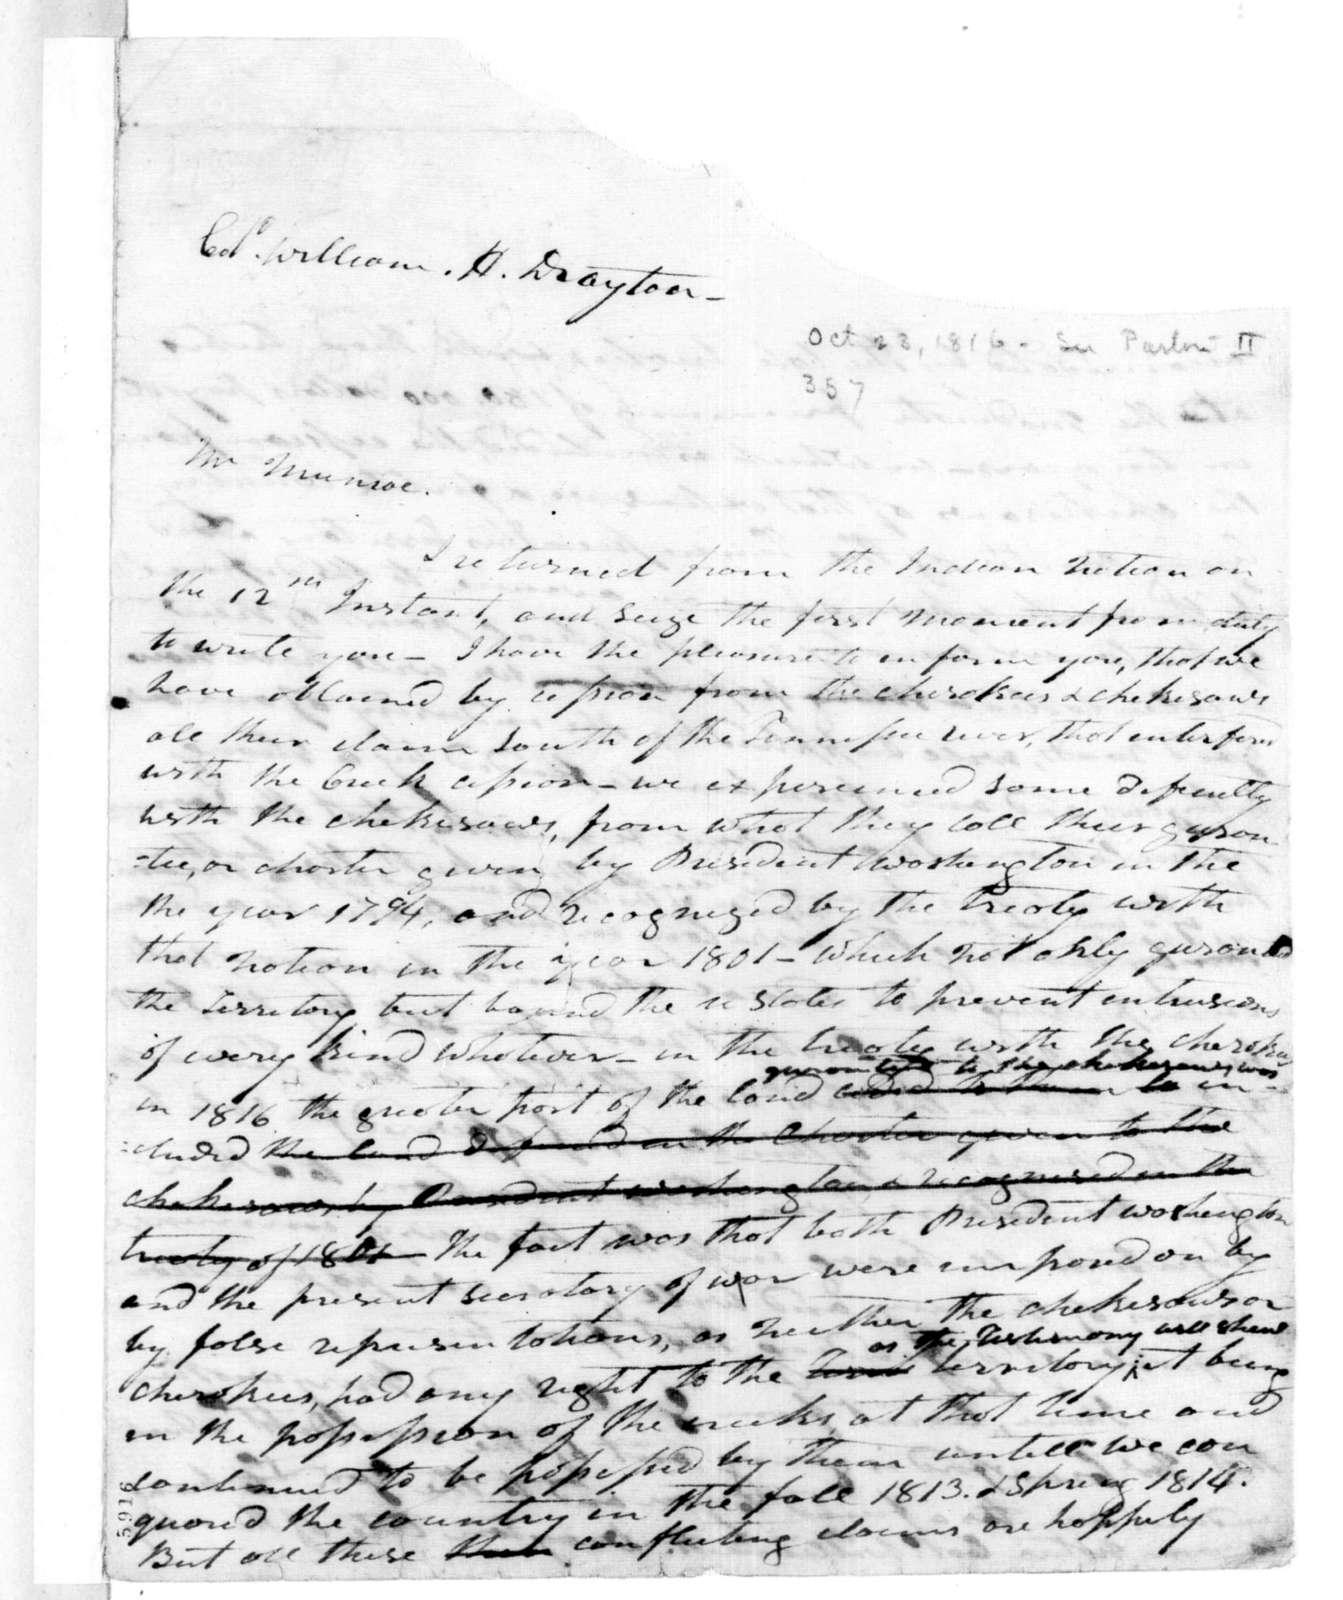 Andrew Jackson to William H. Drayton, October 23, 1816